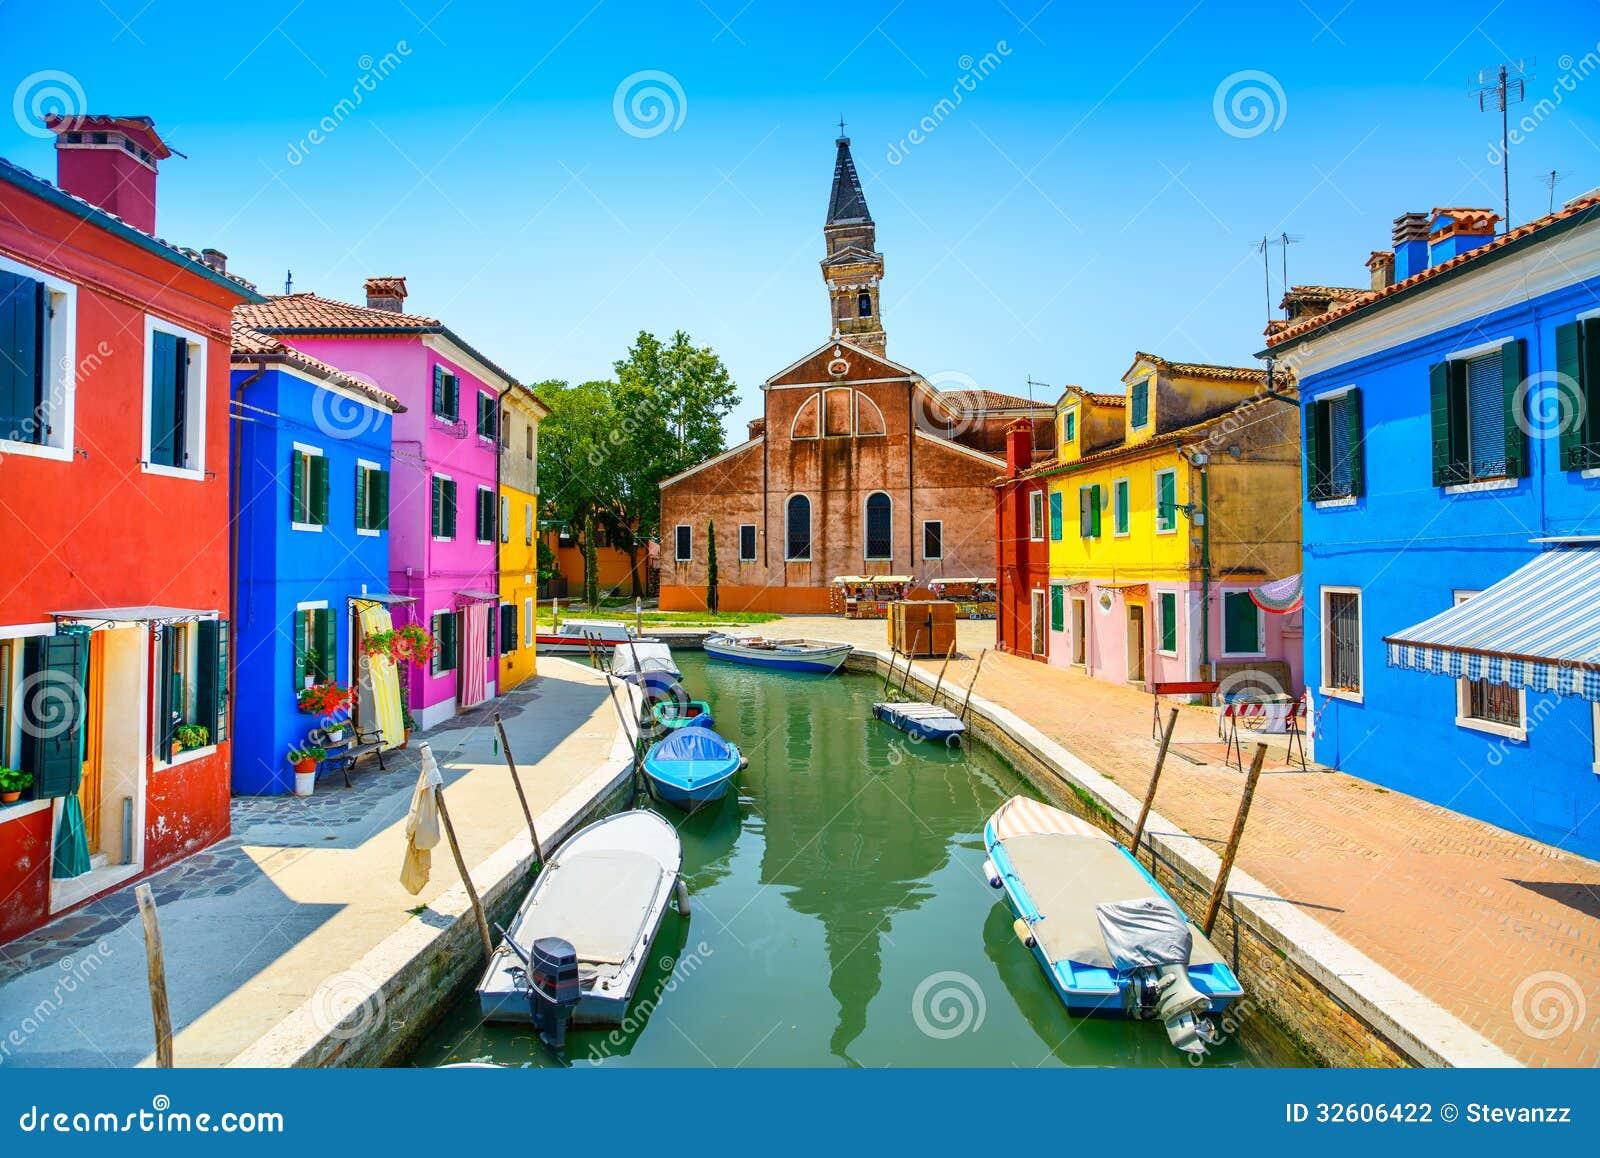 Venice landmark, Burano island canal, colorful houses, church and boats, Italy